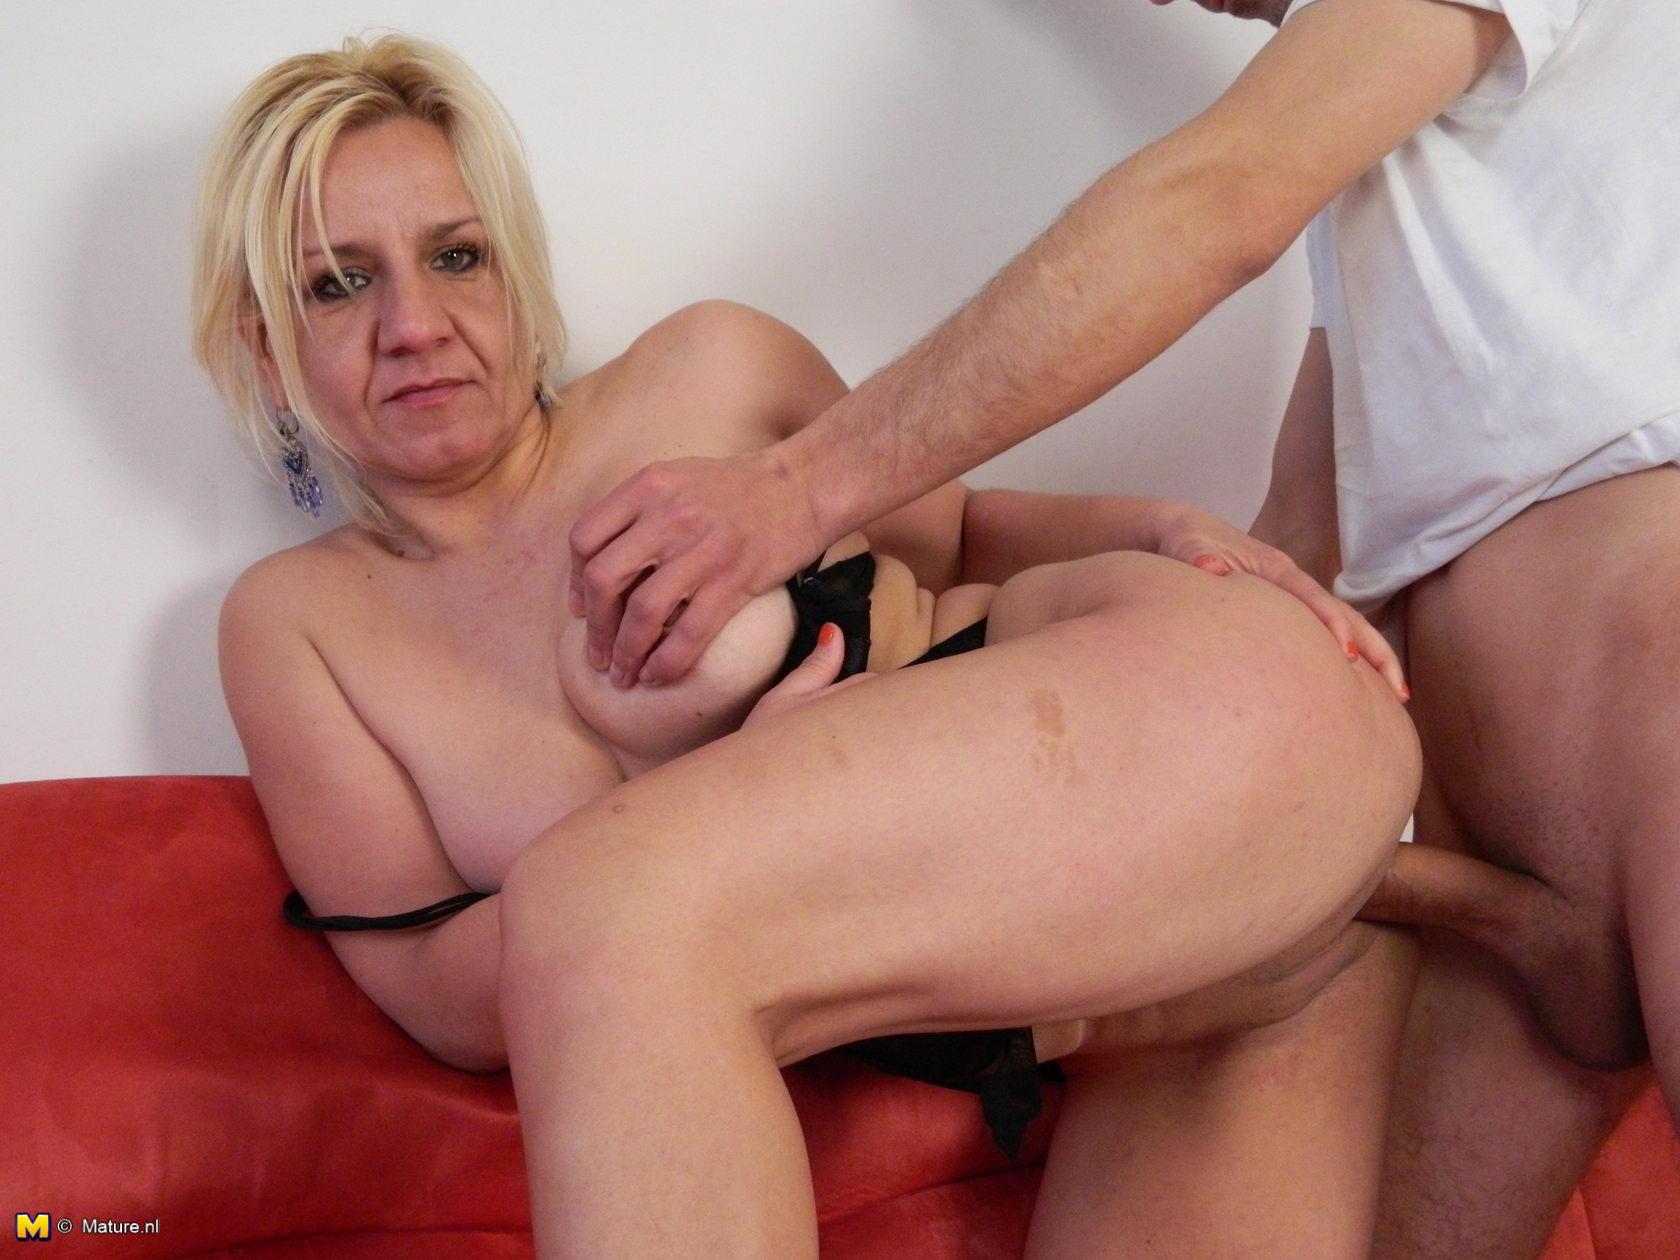 Sexy girls un linrage porn naked porn star